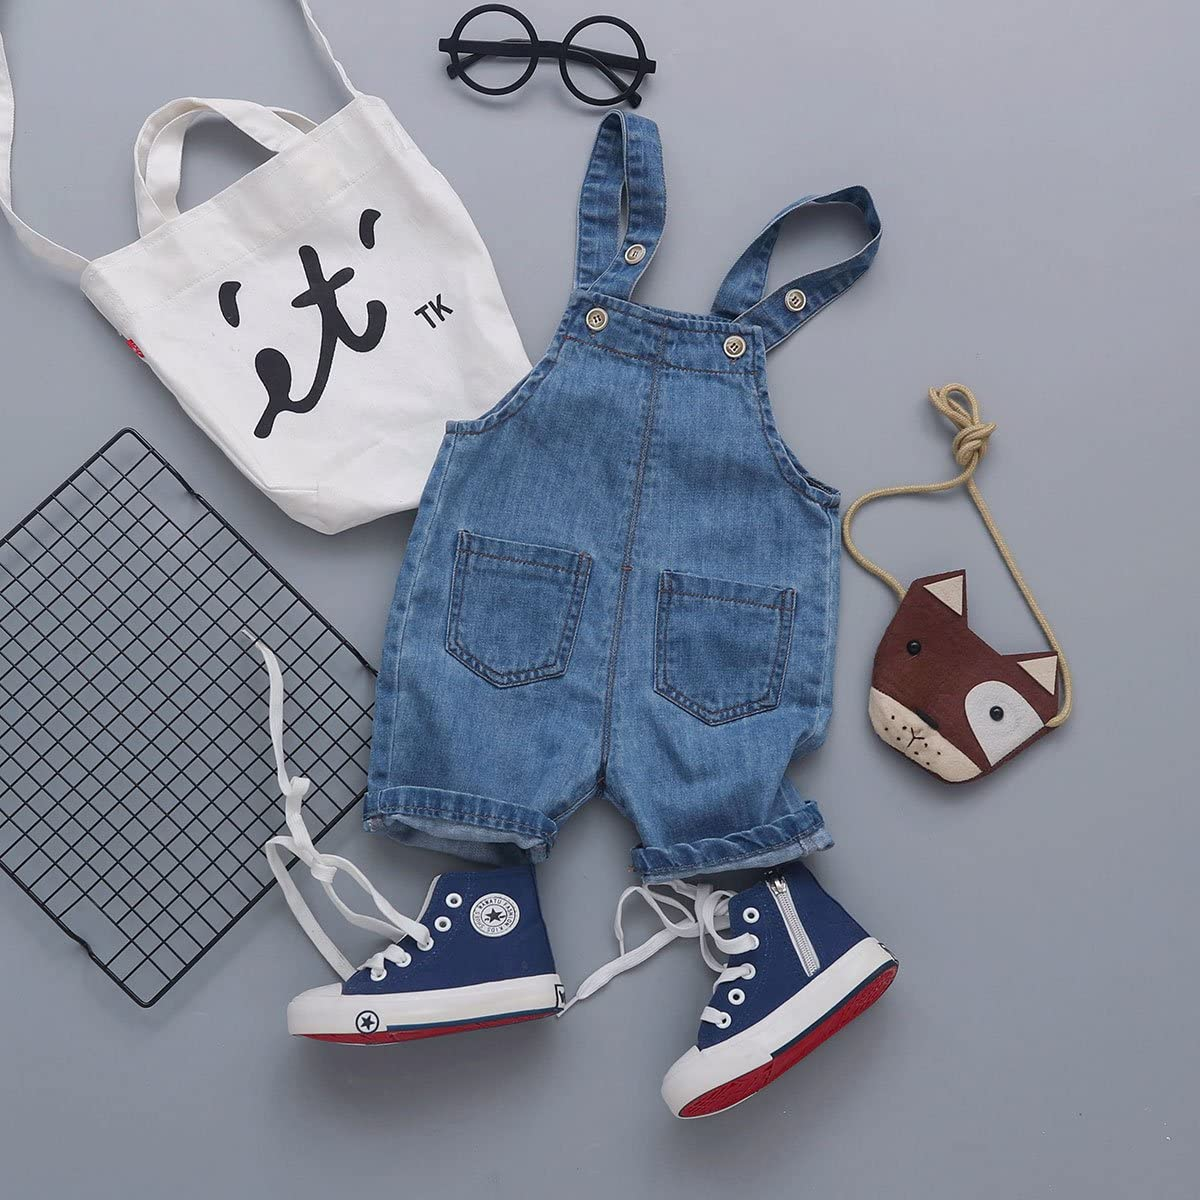 FEOYA Kids Bib Overall Shorts Jeans Suspenders Pants Denim Dungarees Shortalls